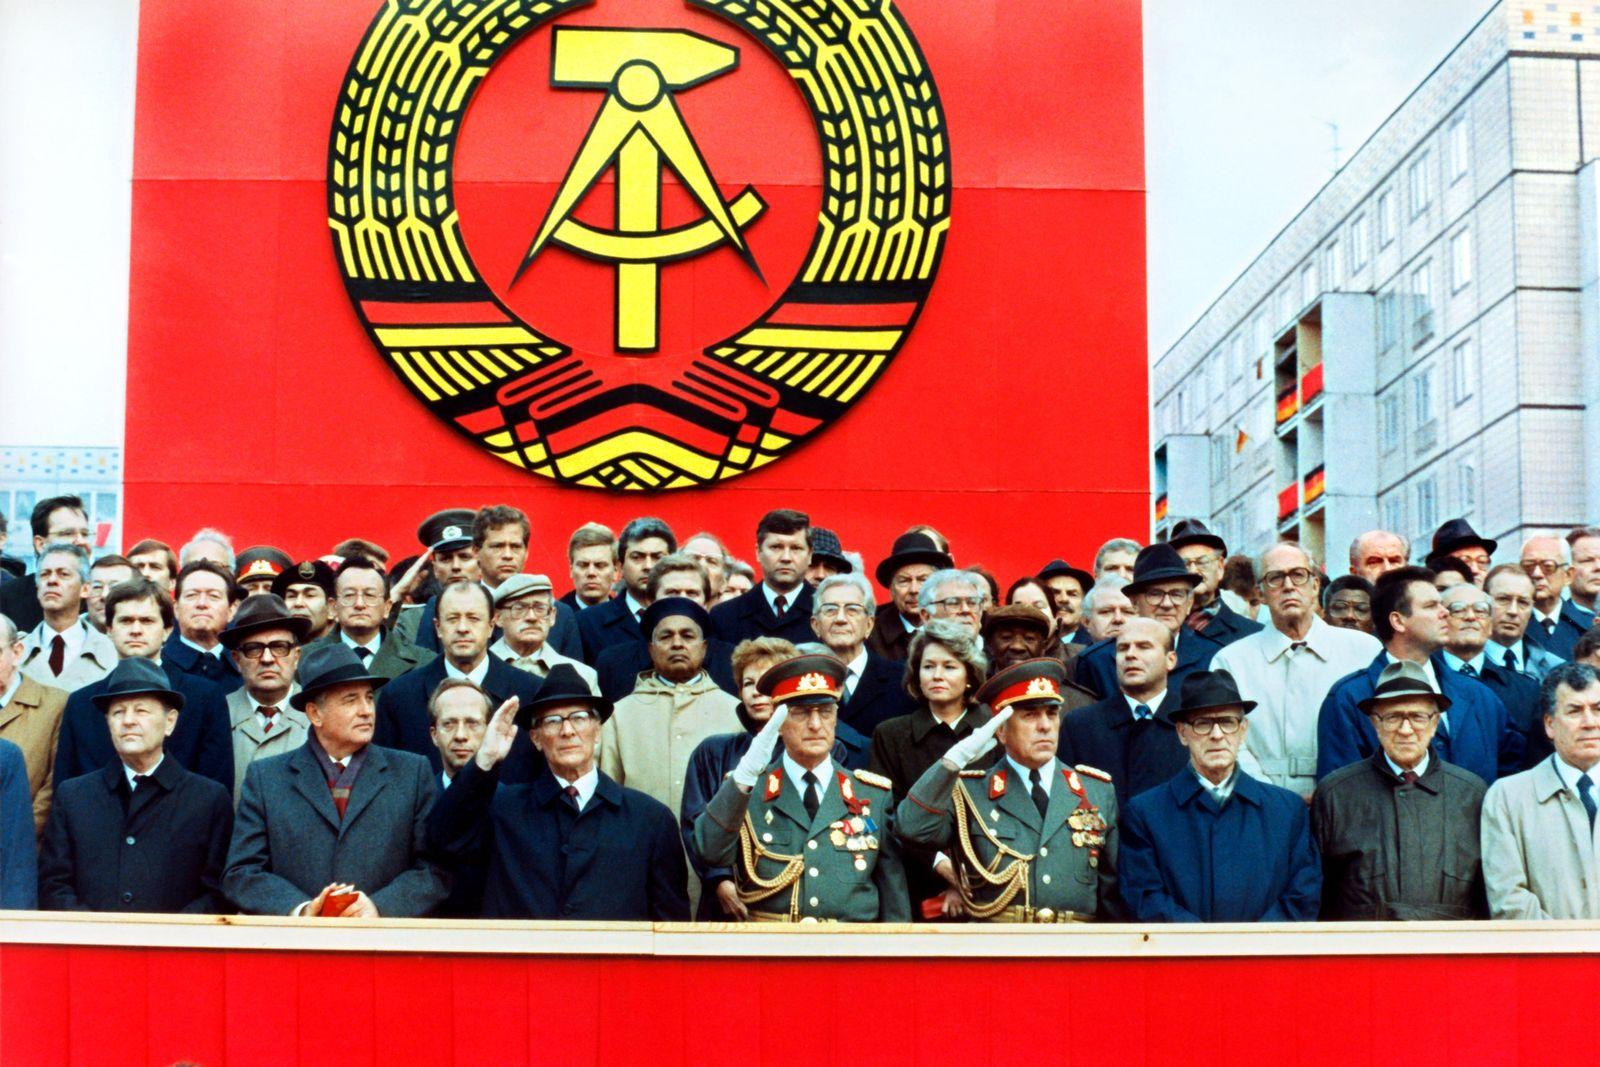 Diktatoren/ Erich Honecker/ Militärparade 1989